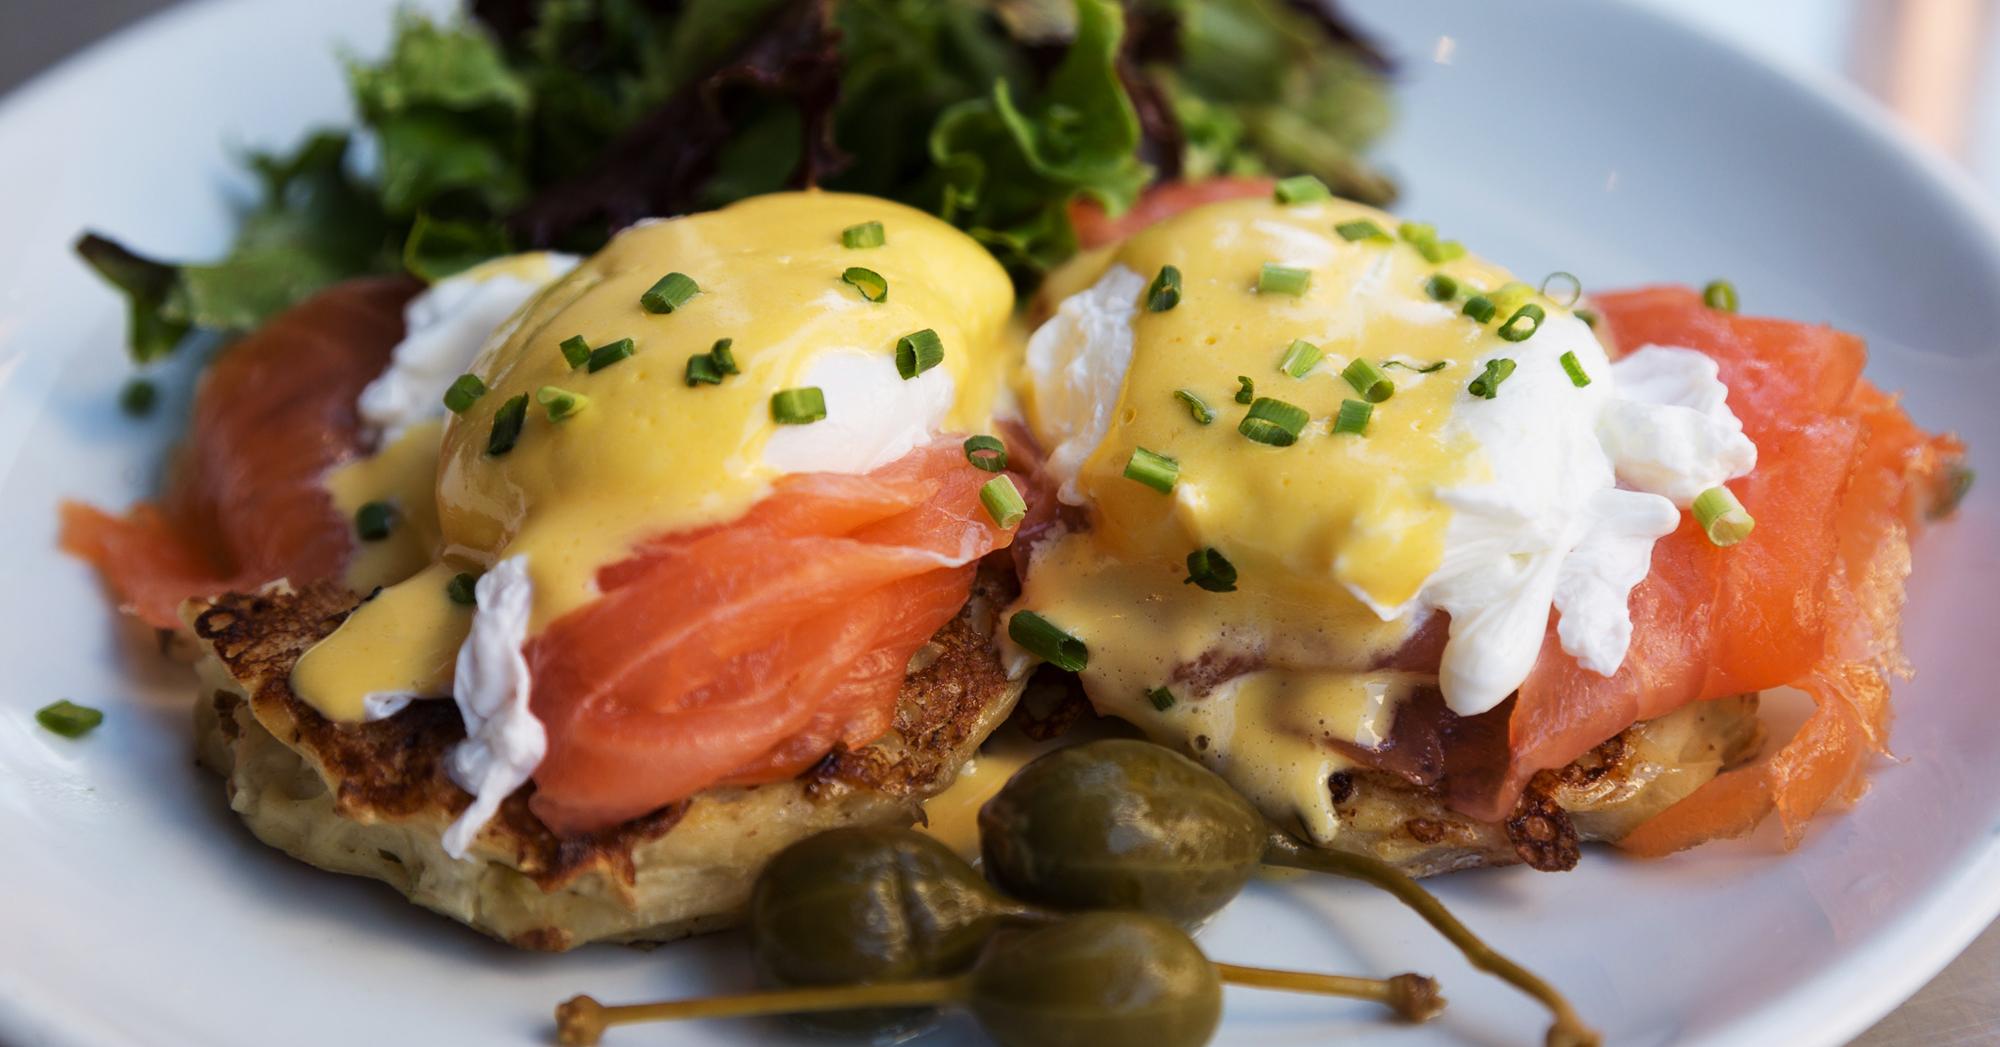 Best Eggs Benedict In Huntington Beach